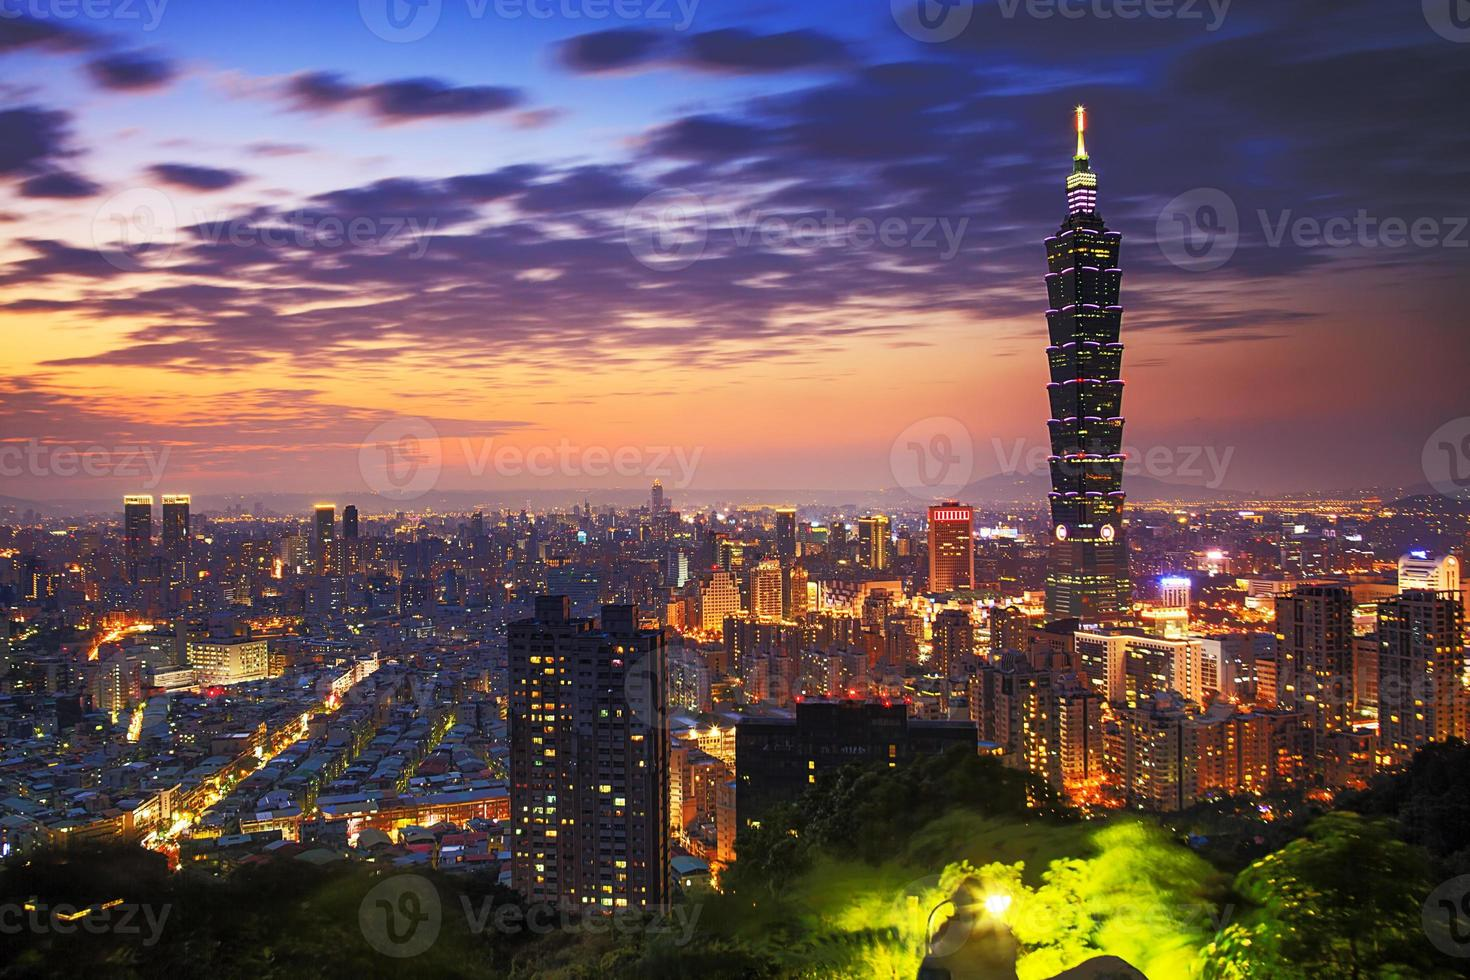 Un colorido paisaje urbano de noche sobre Taipei, Taiwán foto